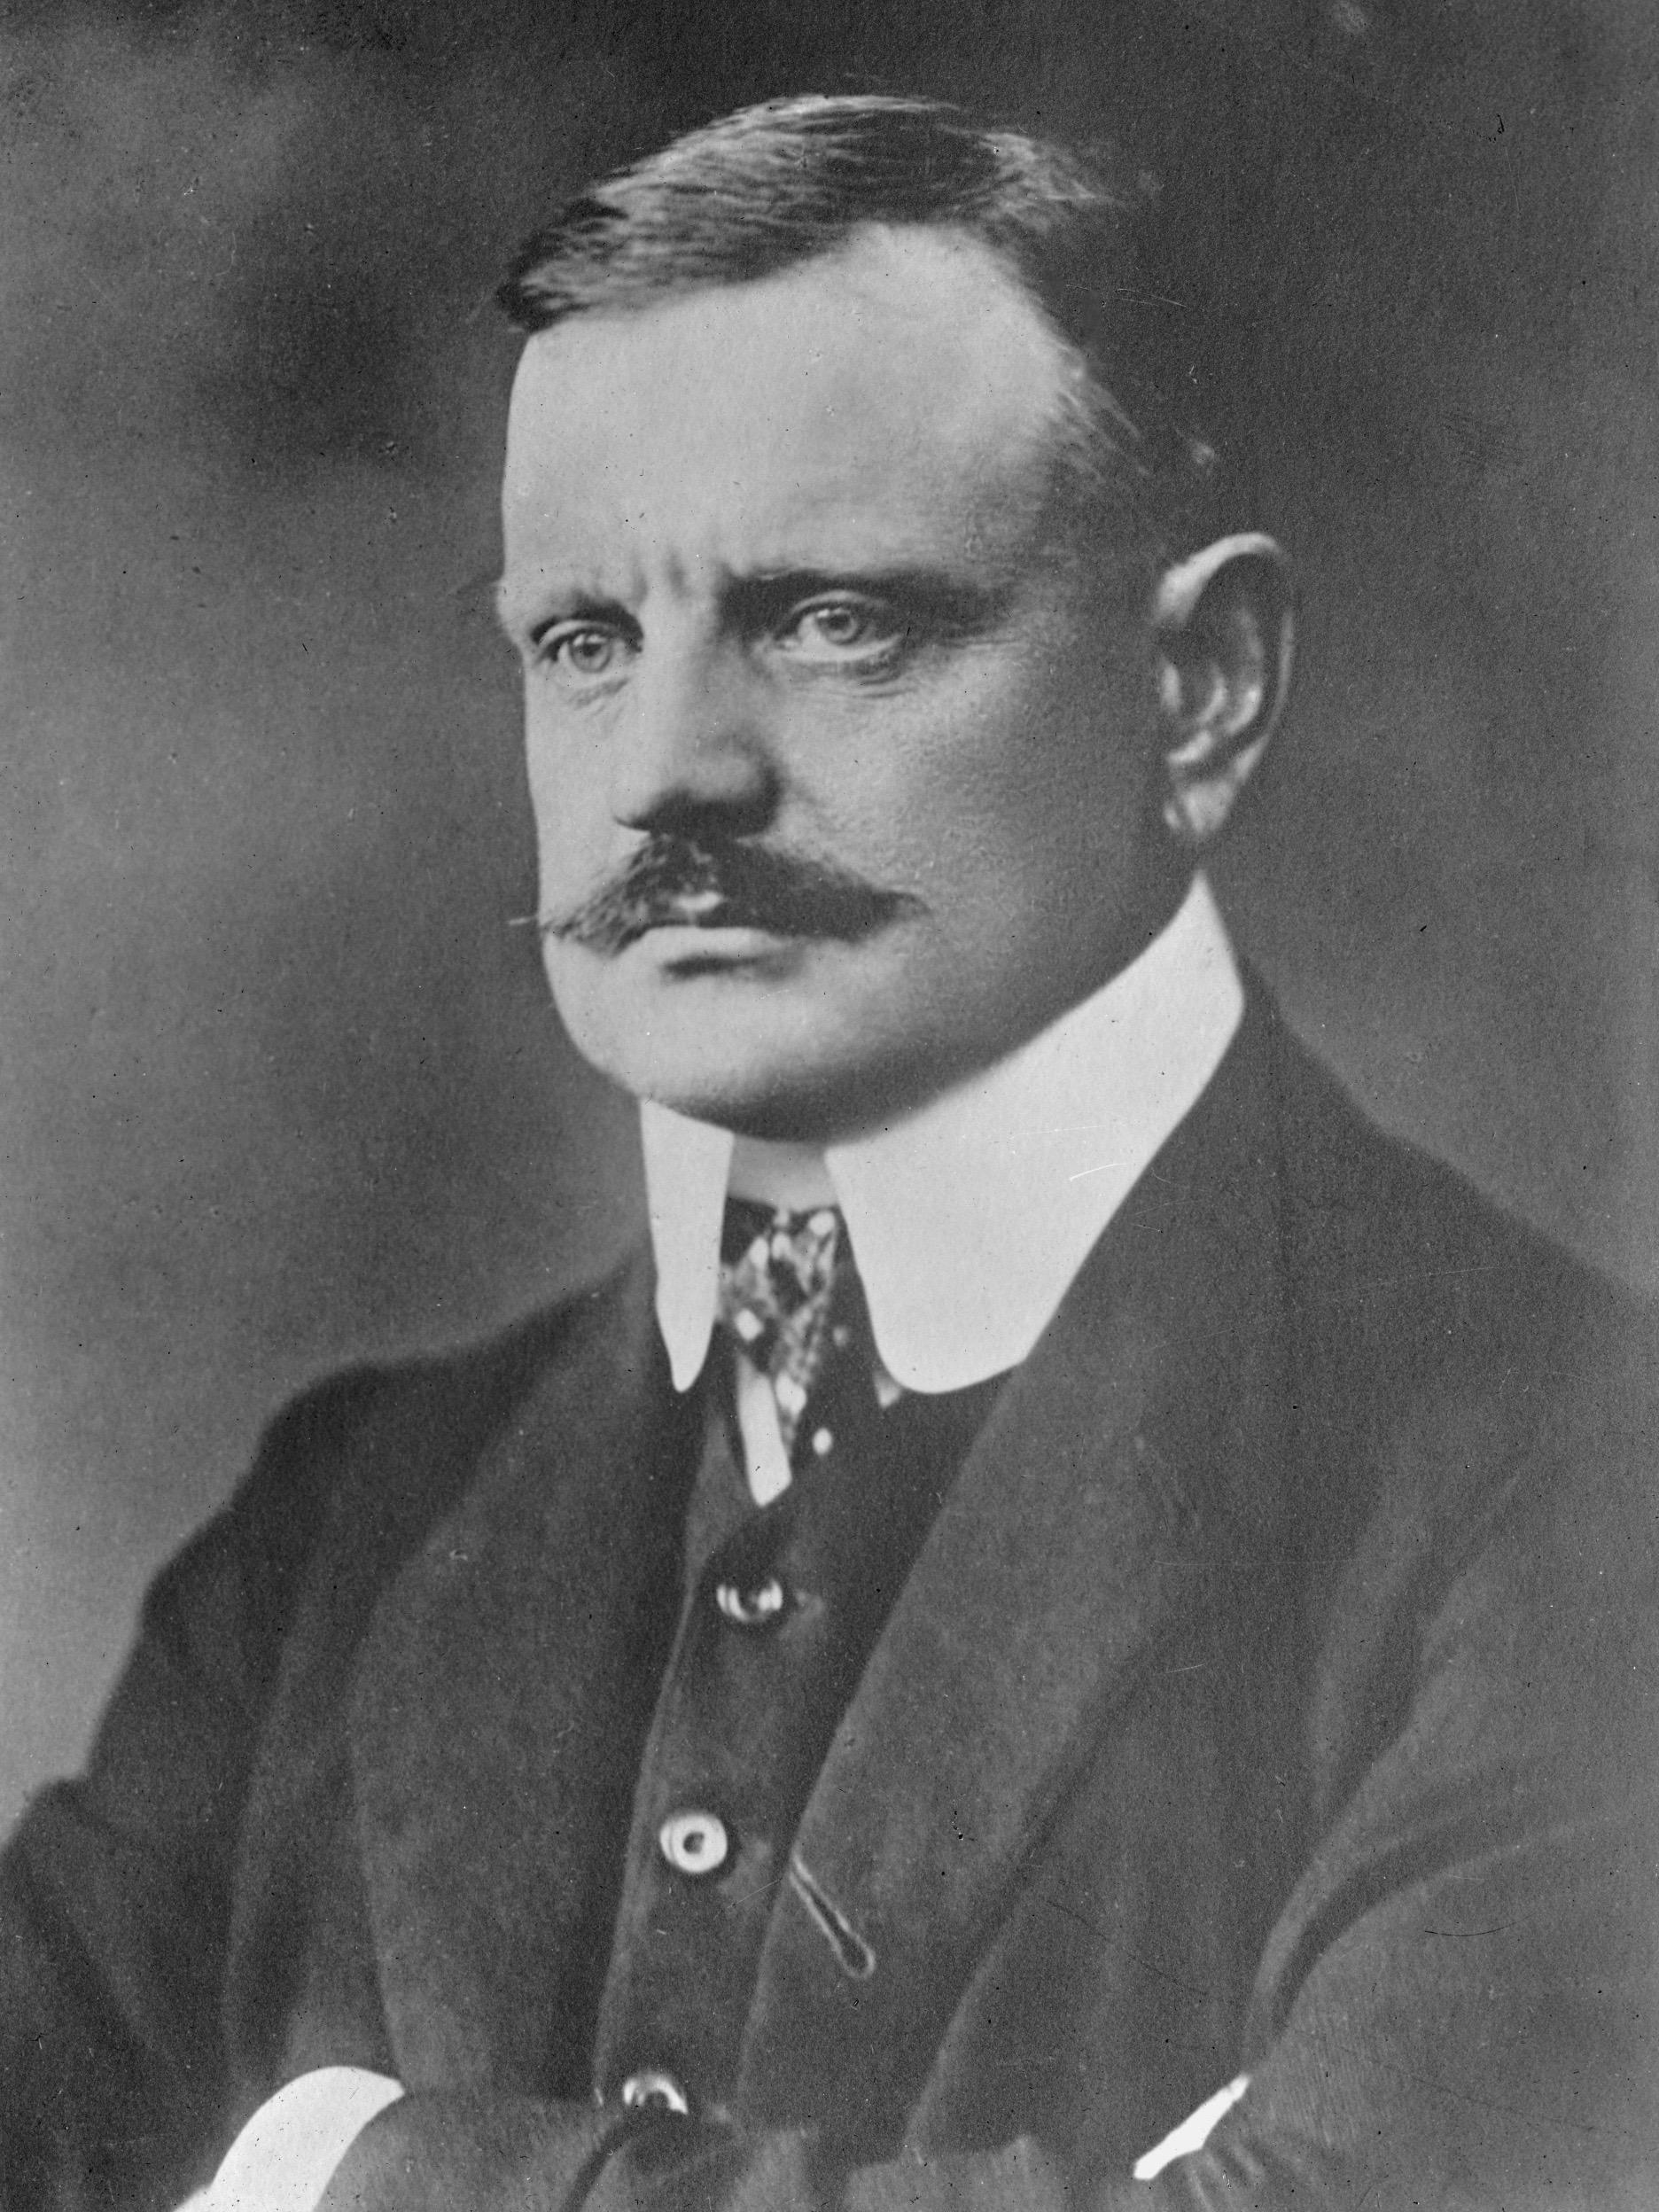 Depiction of Jean Sibelius